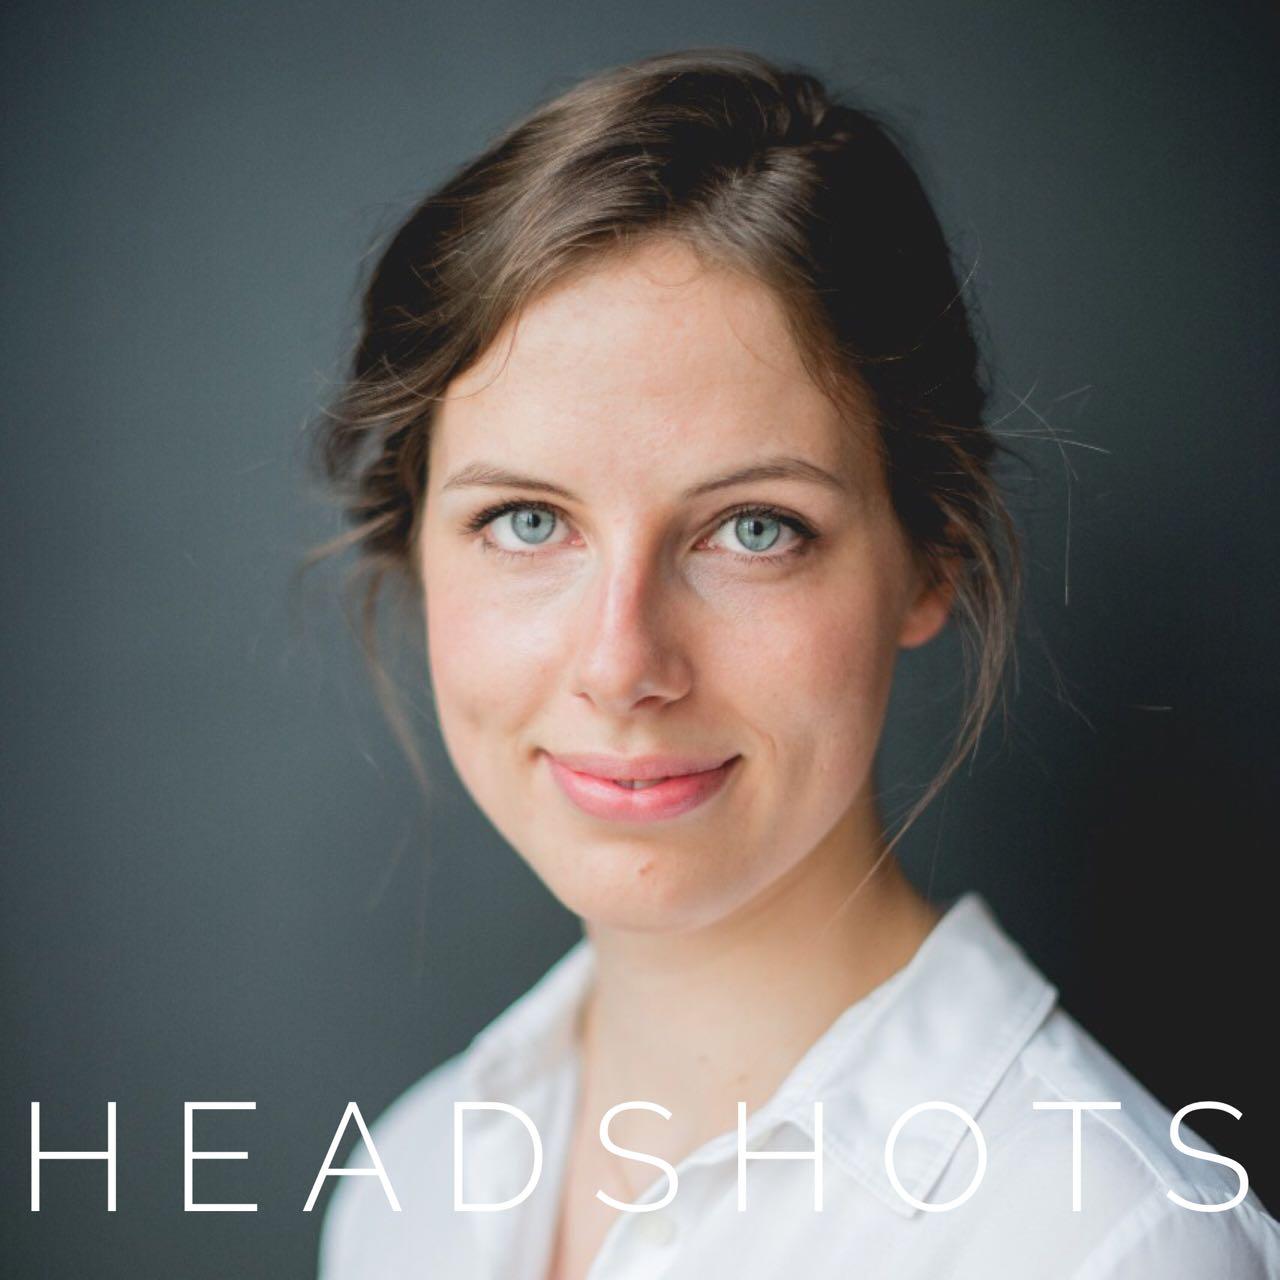 headshots 2.jpeg